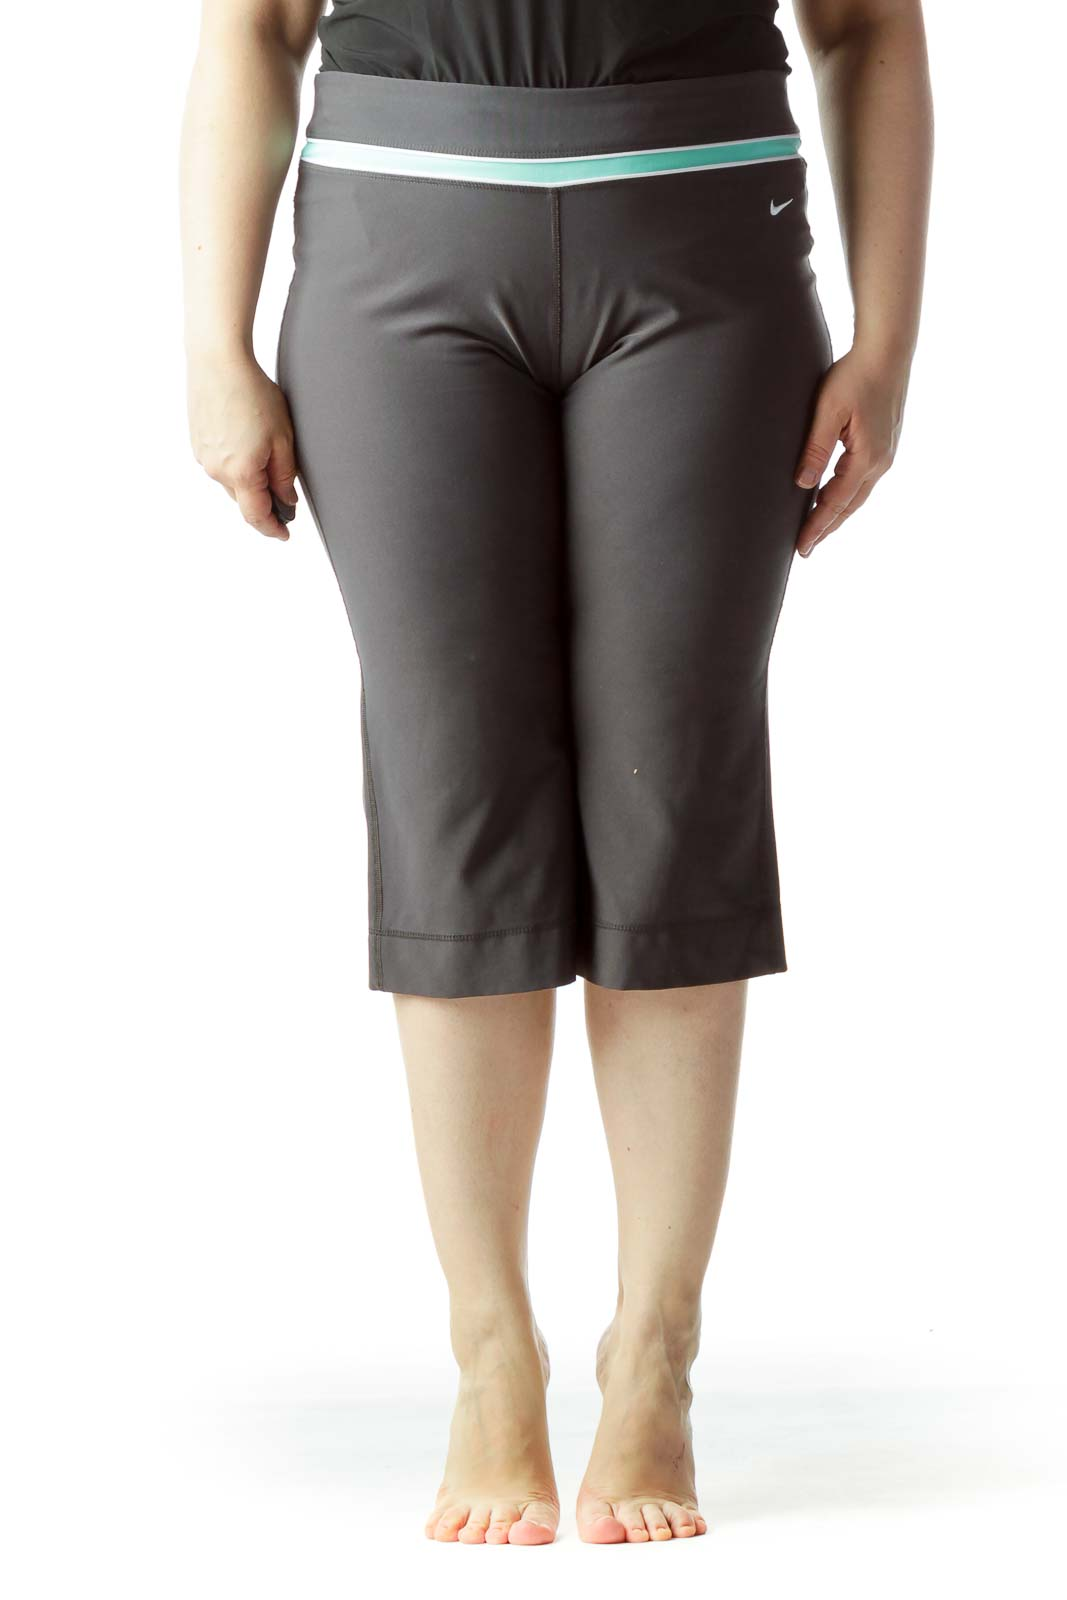 Gray Mint Green White Waist Detail Cropped Sports Pants